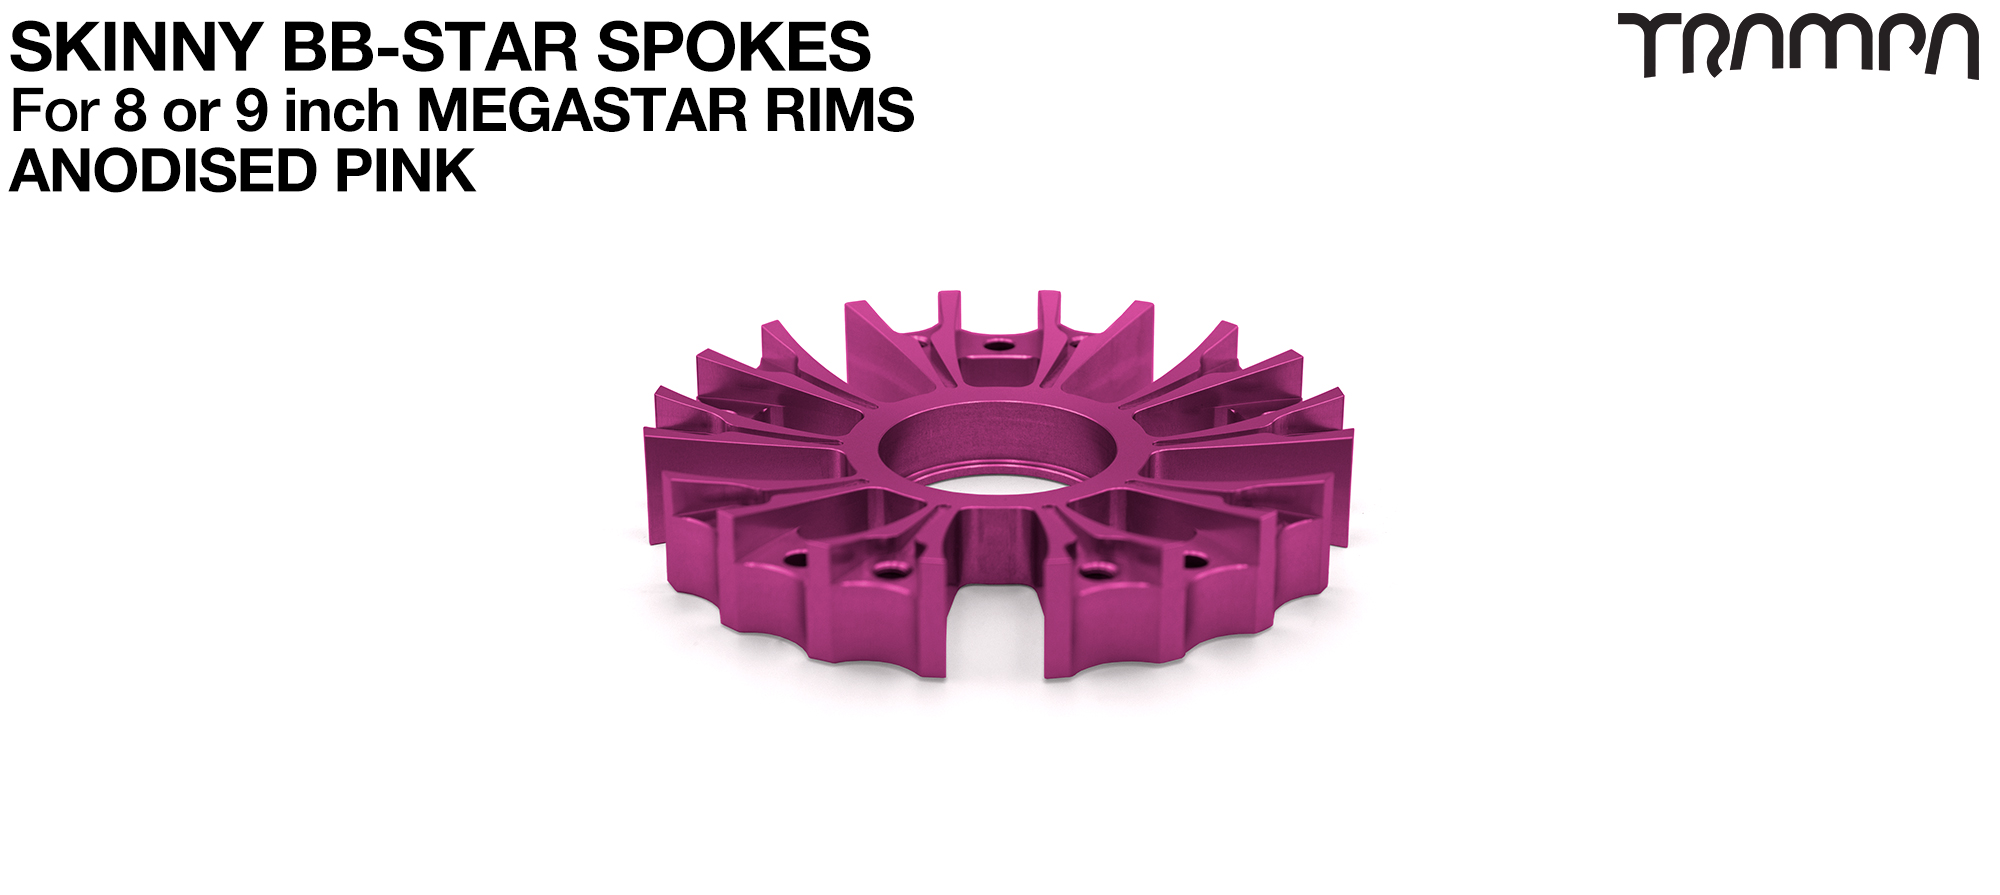 BB Star Spoke for 8 Inch DEEP-DISH MEGASTAR Rim - CNC Precision milled - PINK